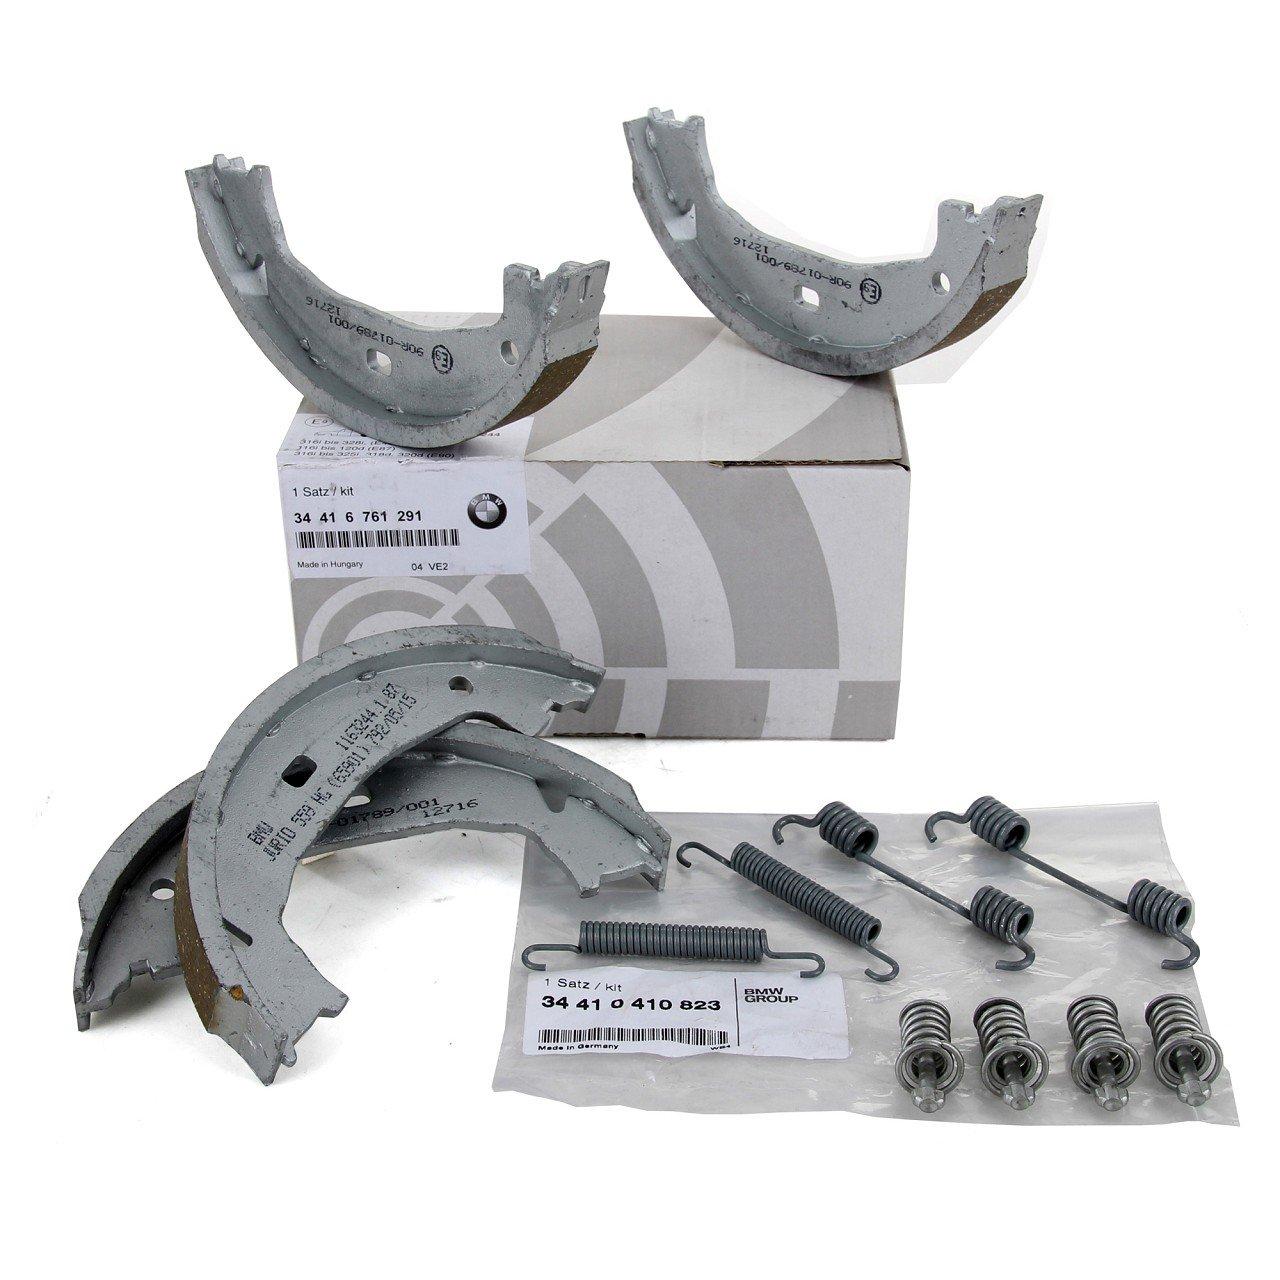 ORIGINAL BMW Bremsbacken + Federn Satz E81-E88 F20 F21 E46 F90-E93 Z4 E86